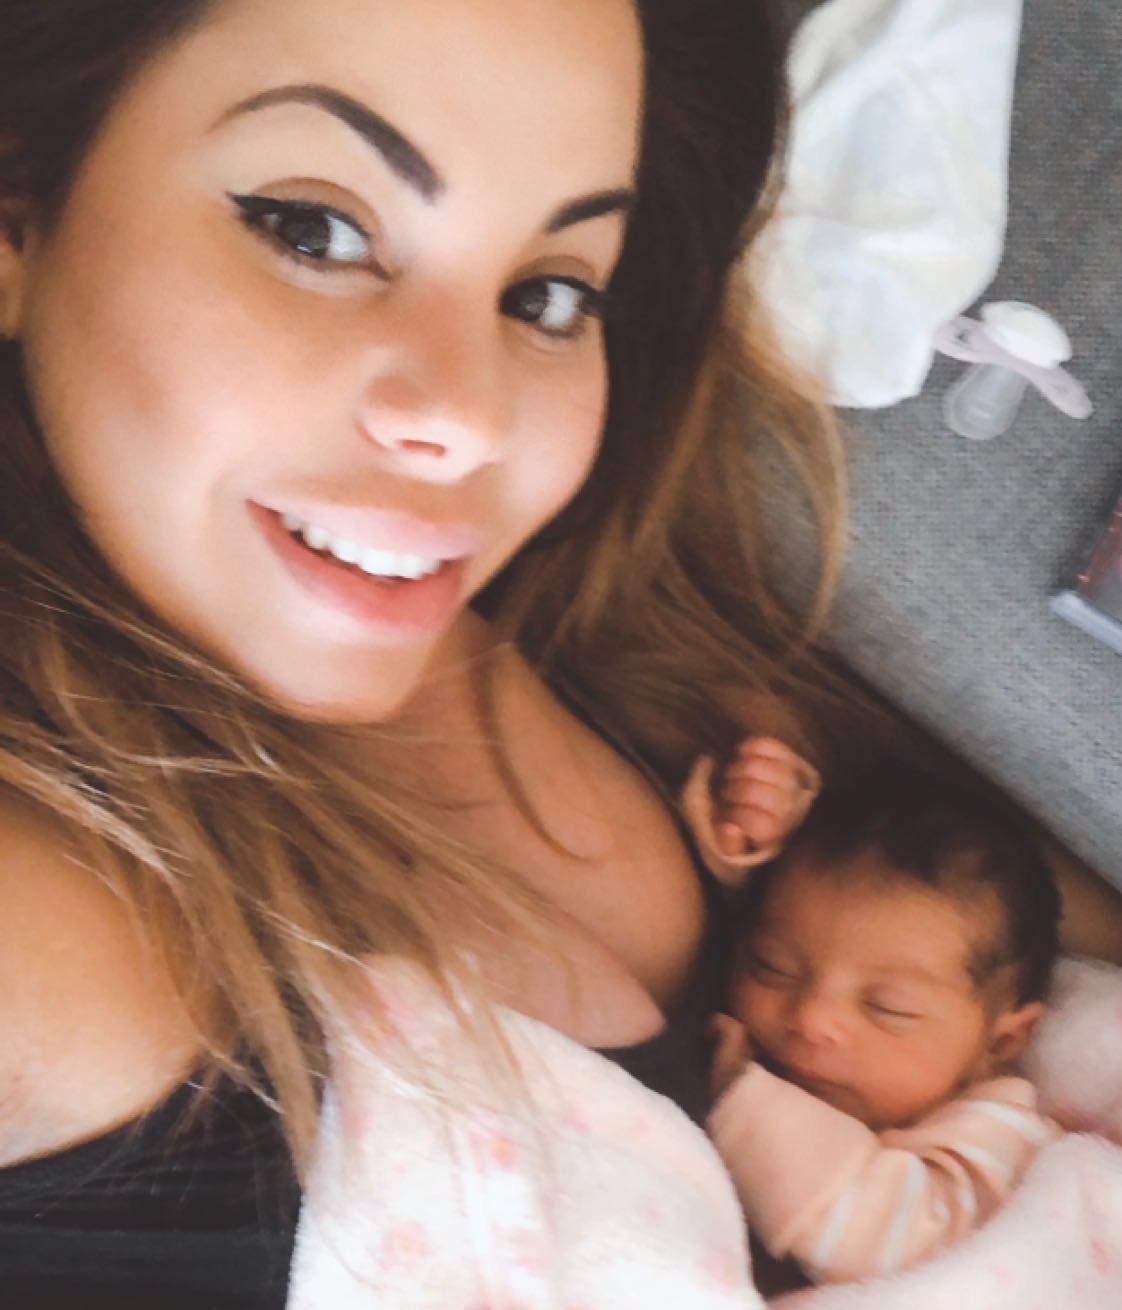 Jessica med sin dotter.